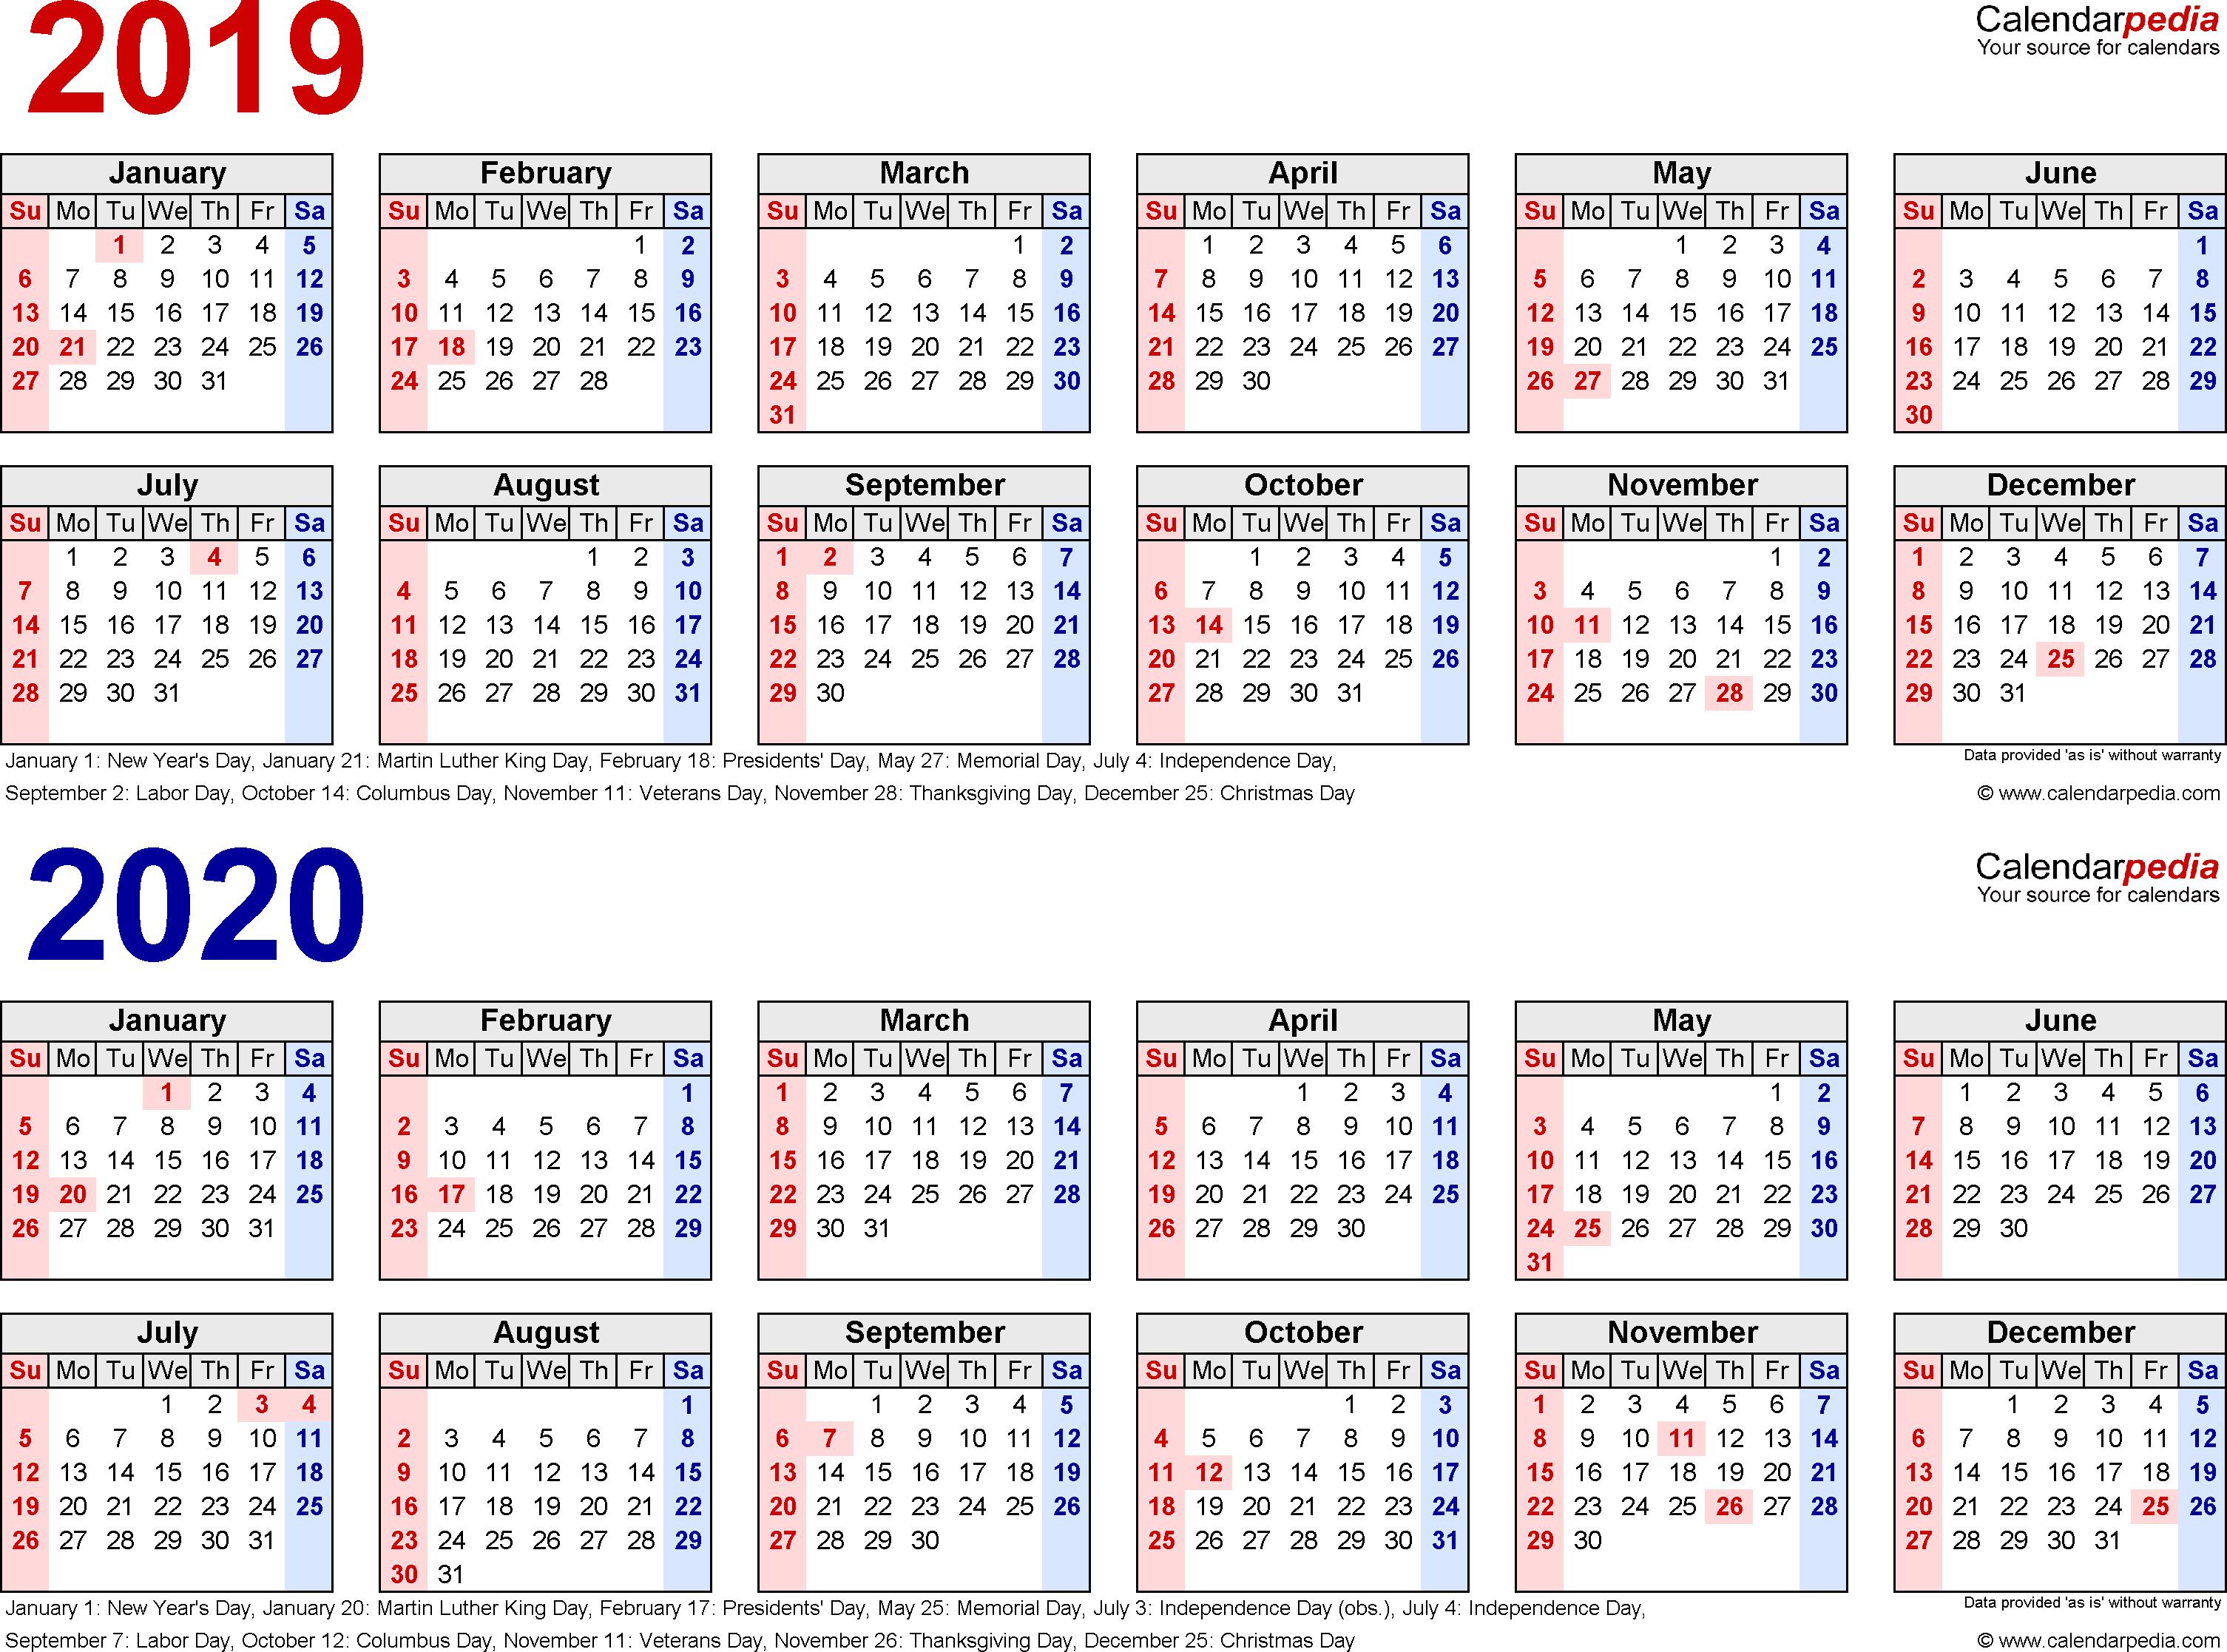 2019-2020 Calendar - Free Printable Two-Year Pdf Calendars intended for 2020 Calendar Printable Free Pdf